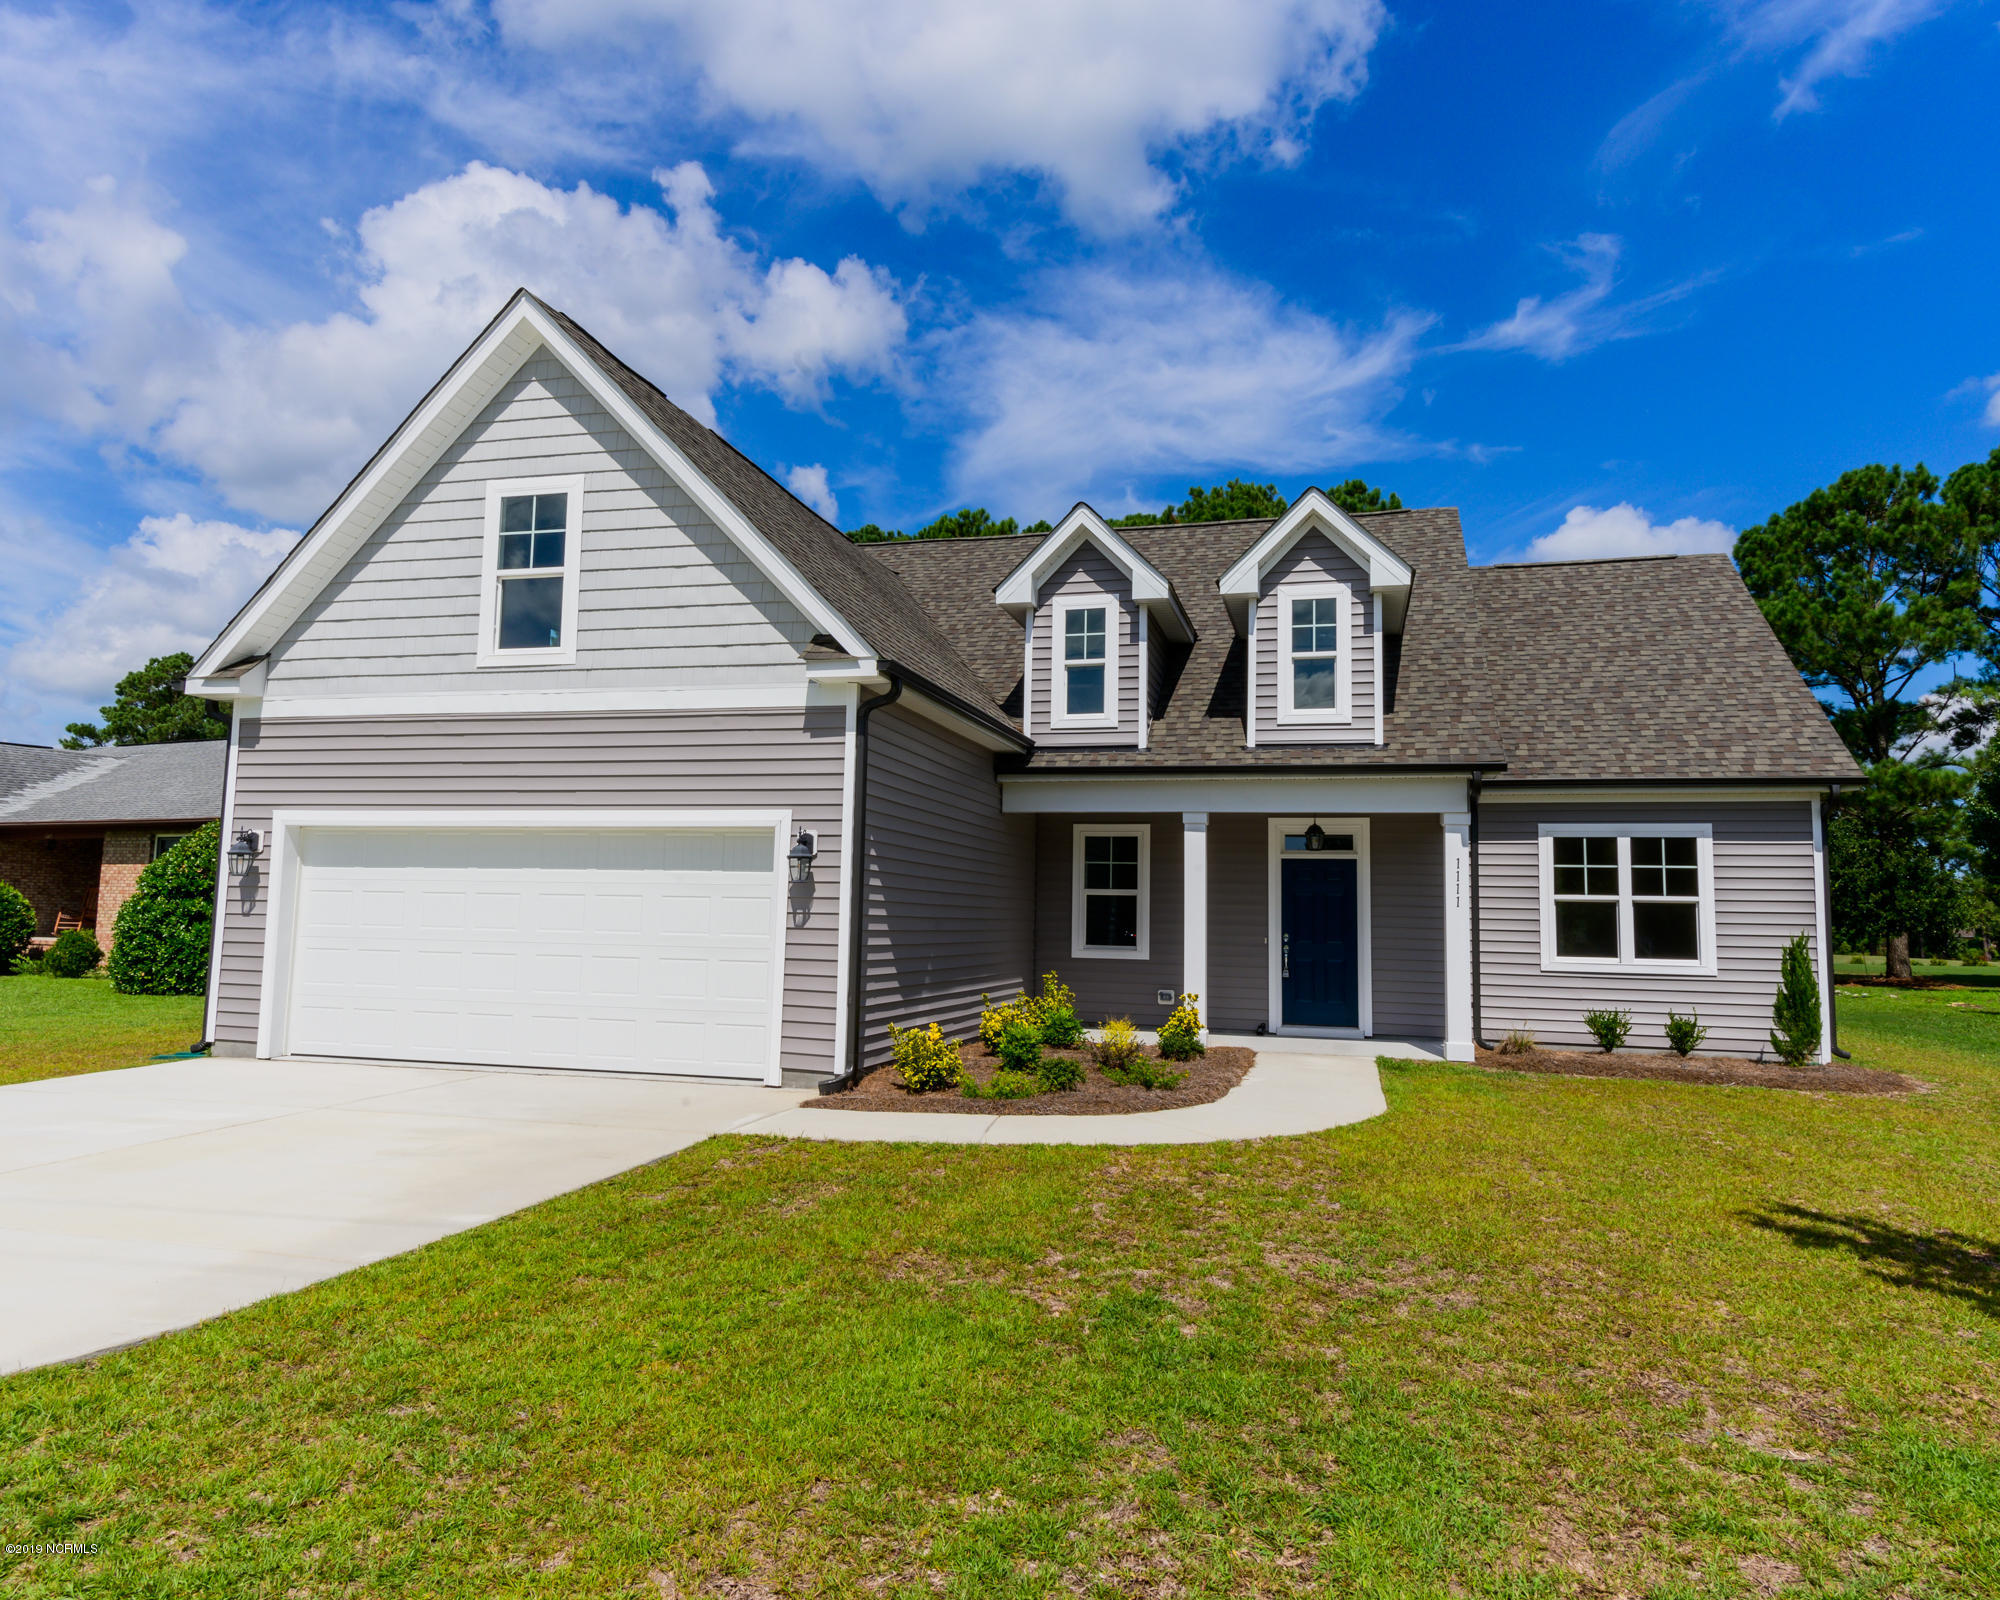 1111 Pelican Drive, New Bern, North Carolina 28560, 3 Bedrooms Bedrooms, 7 Rooms Rooms,2 BathroomsBathrooms,Single family residence,For sale,Pelican,100180427